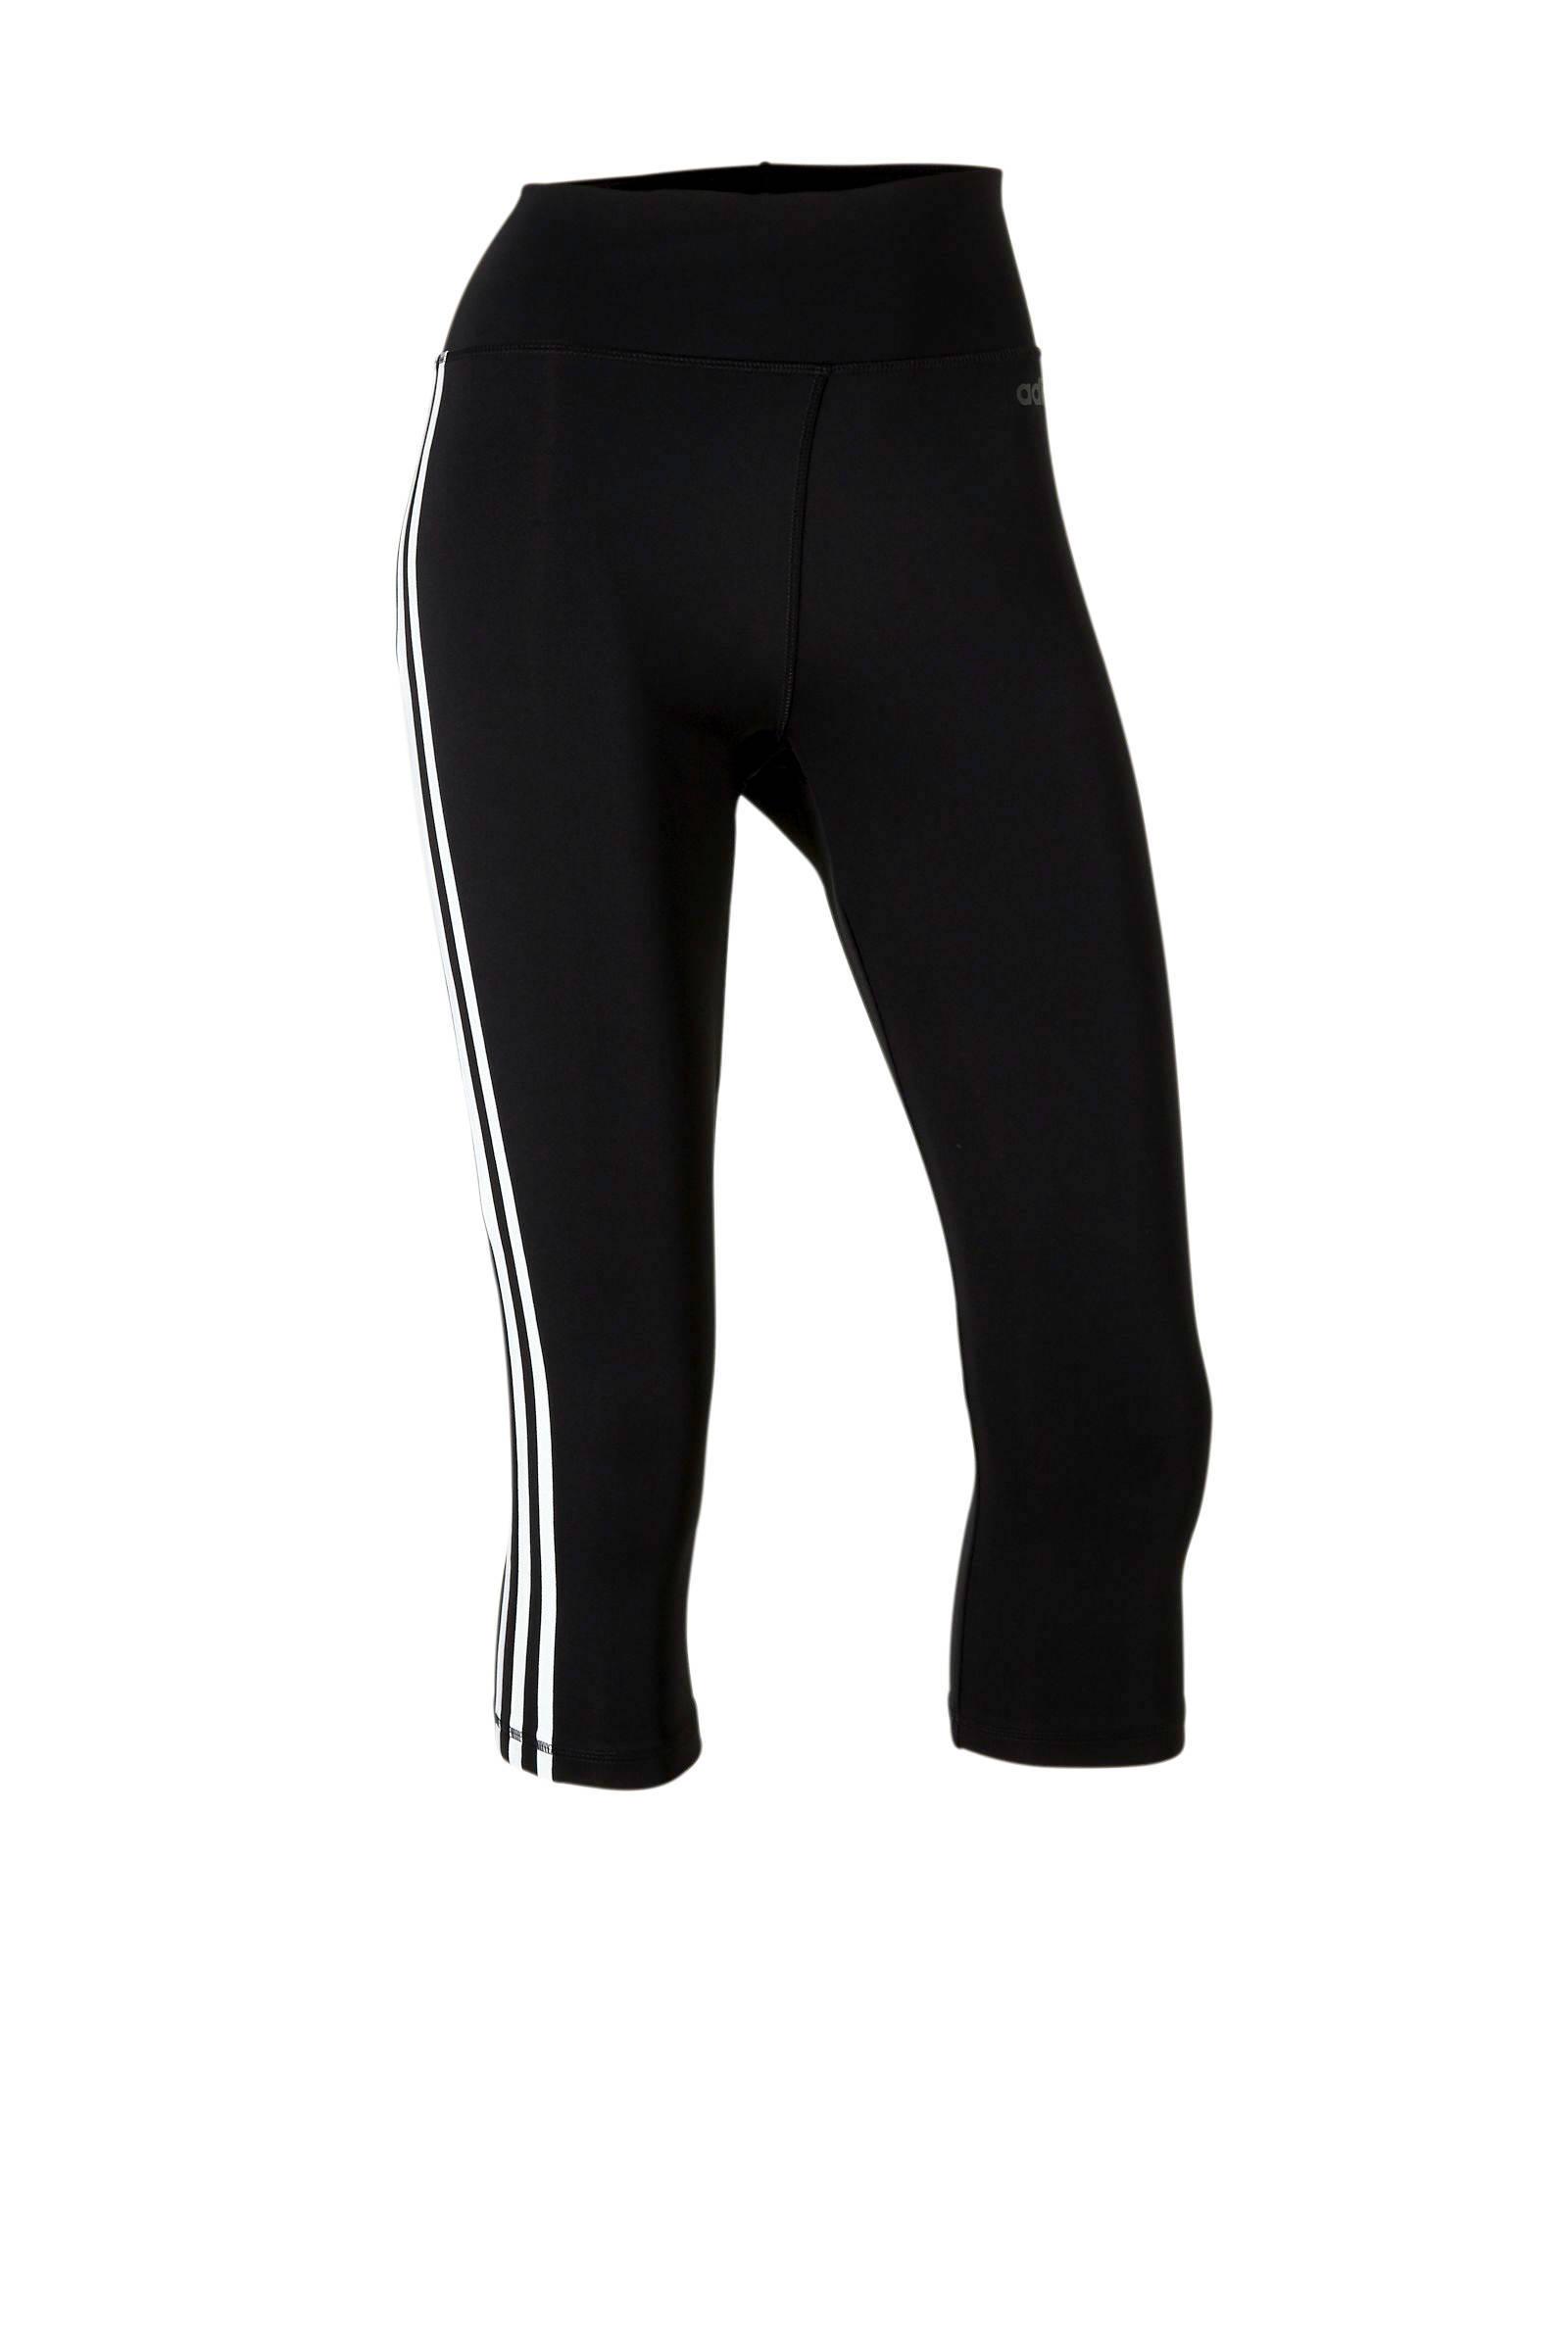 adidas performance Sportkleding dames bij wehkamp - Gratis ...